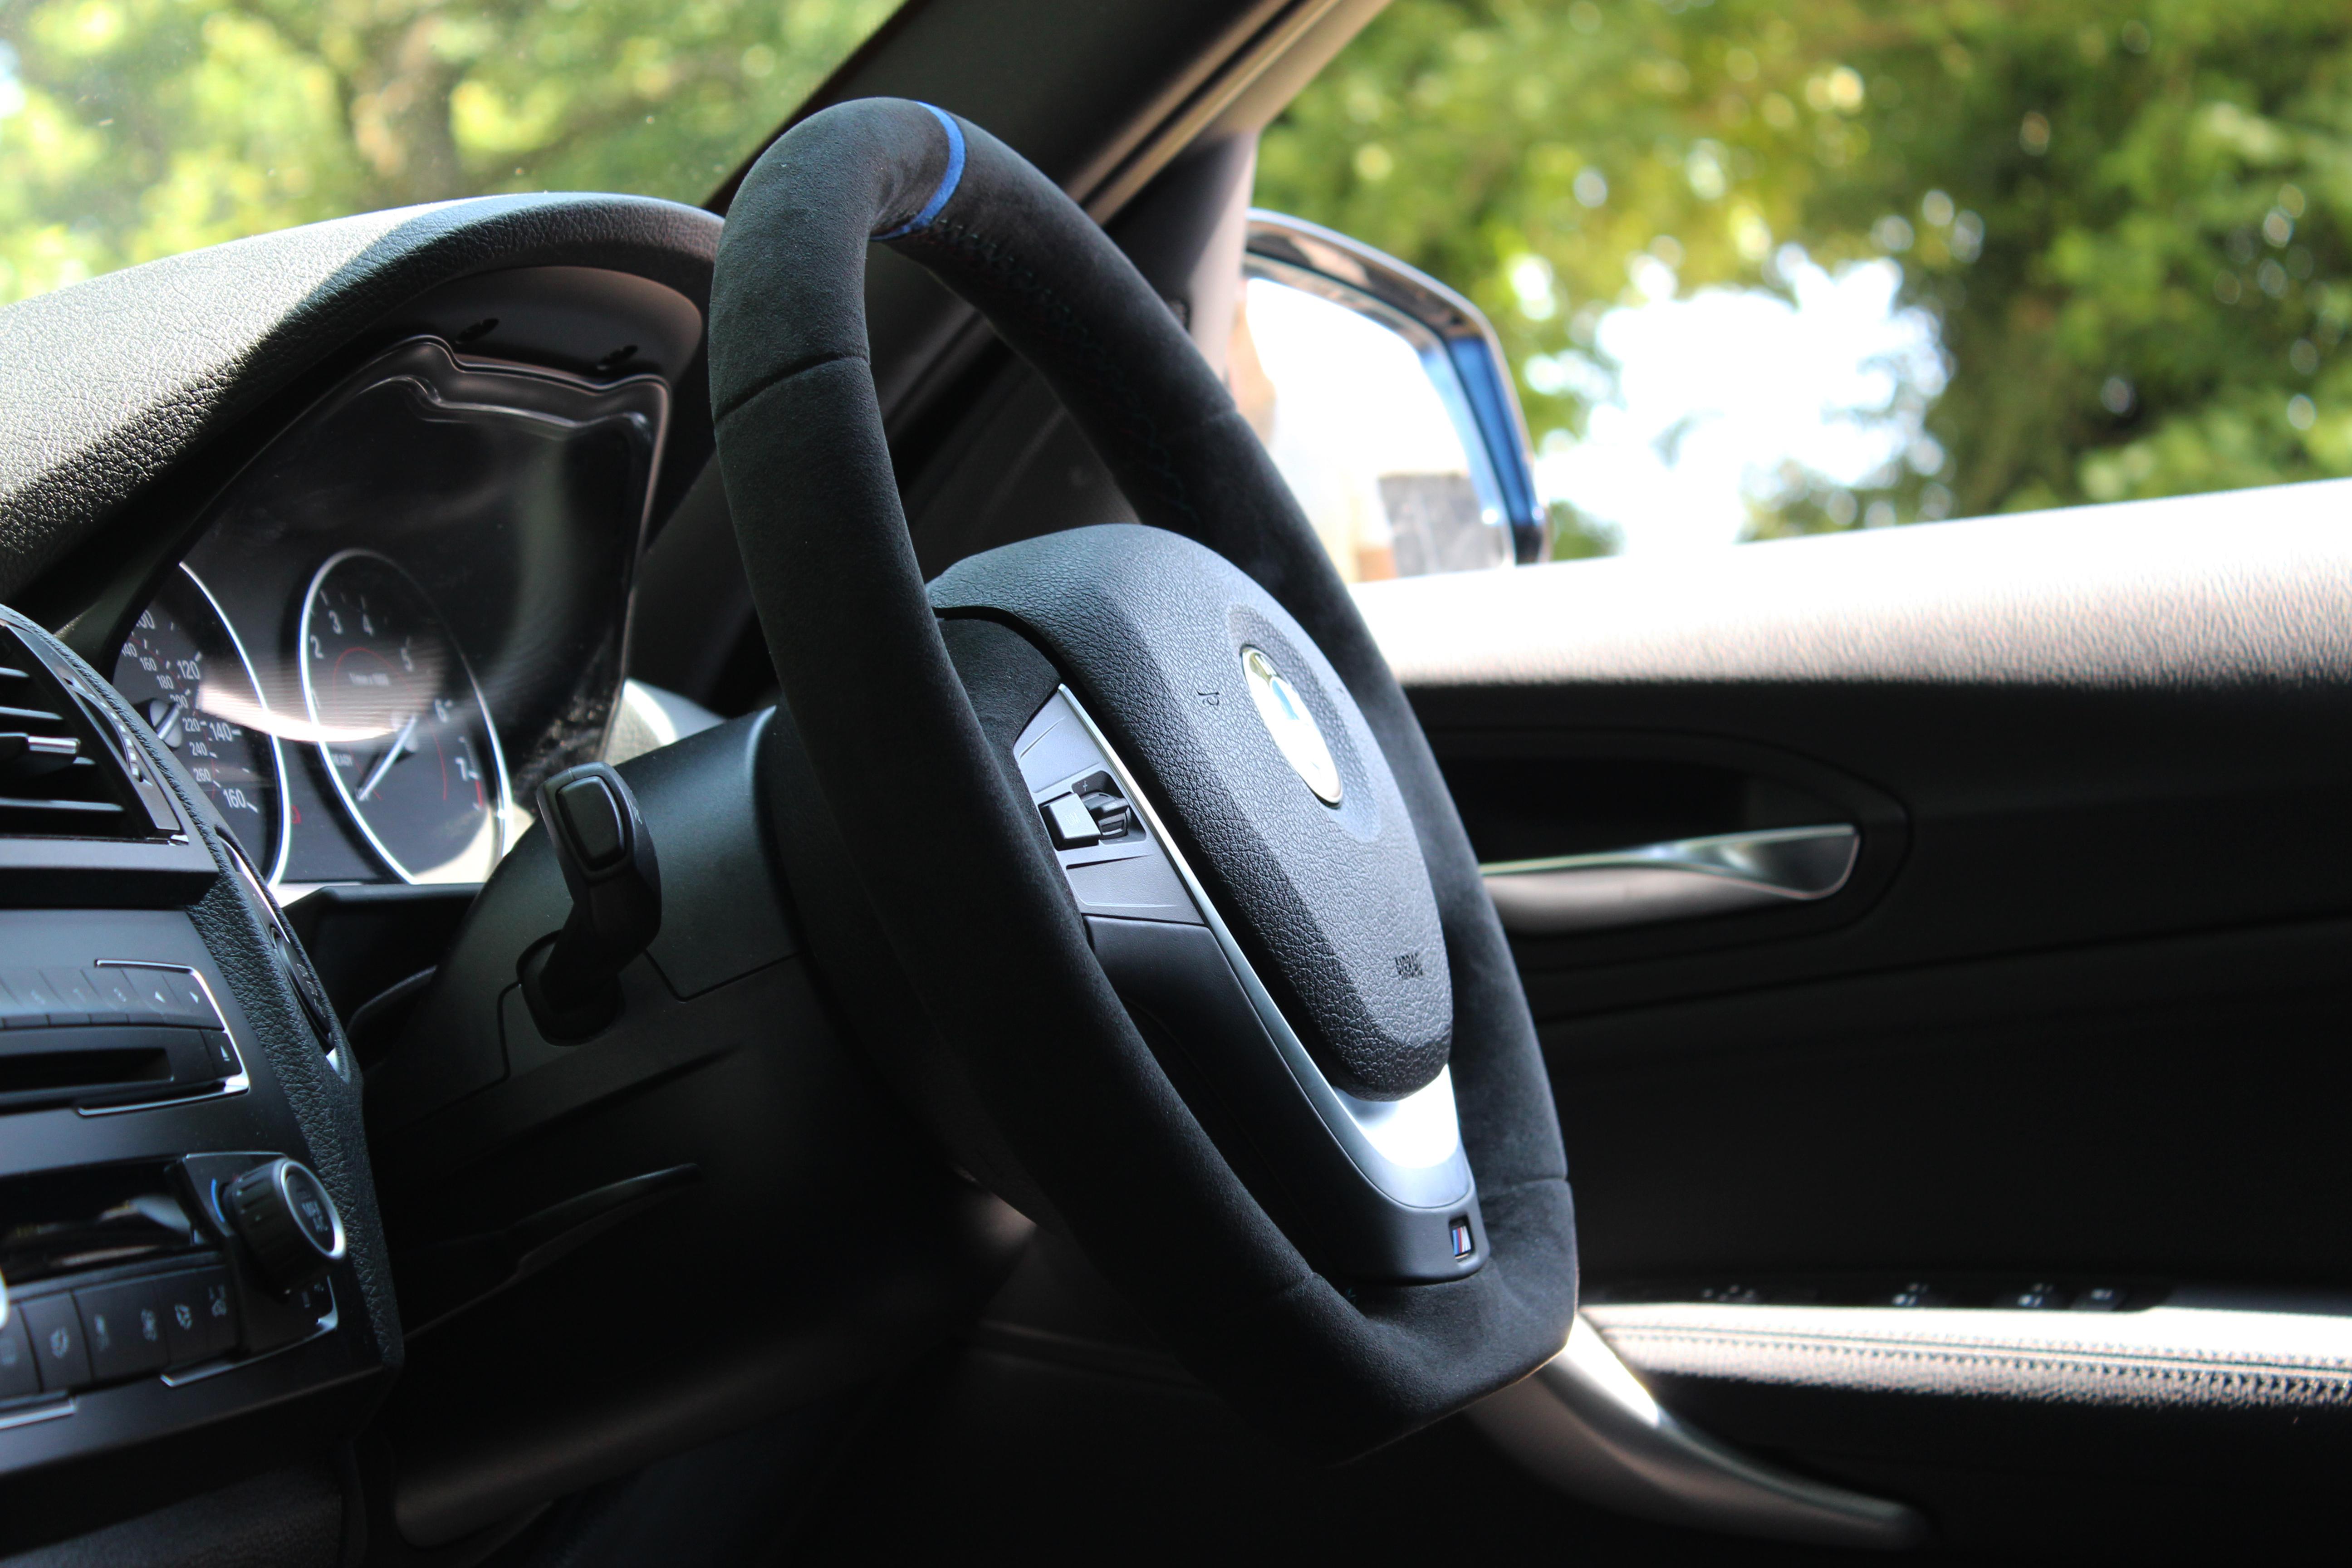 Steering Wheel Re Trim Retrim And Repair Services Leather Alcantara